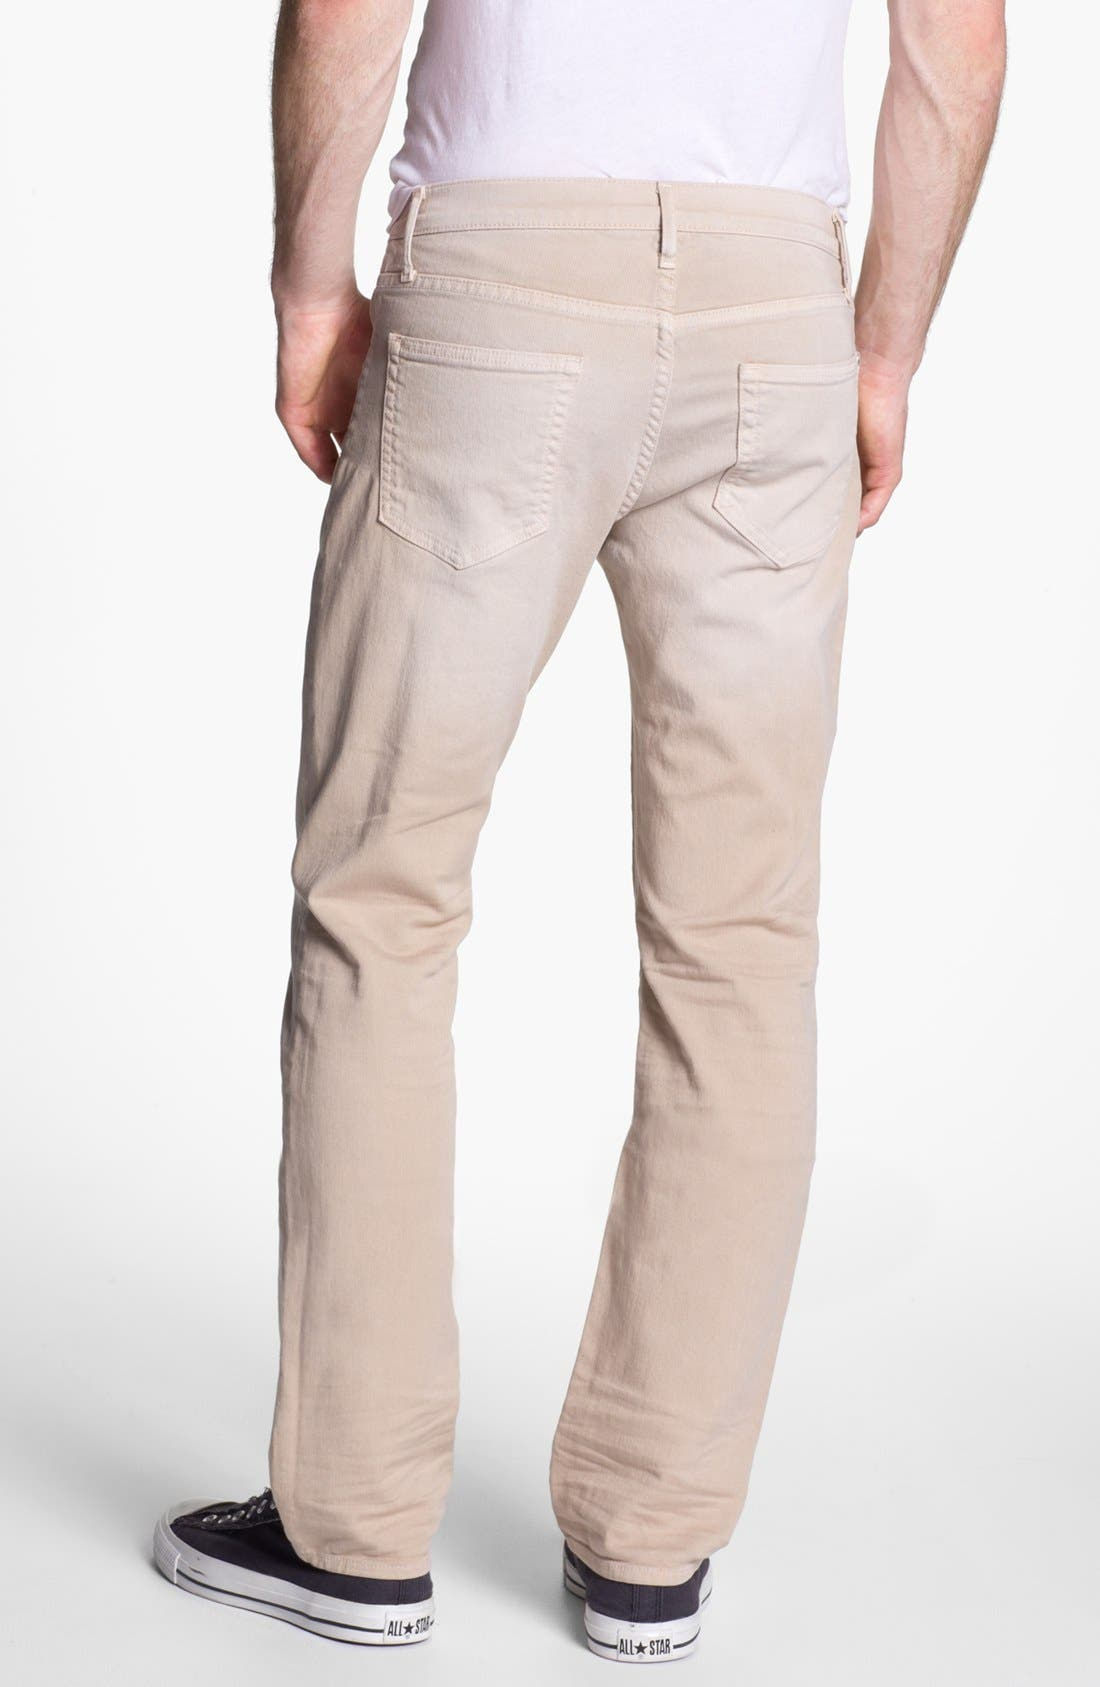 Main Image - Koral 'Los Angeles' Slim Leg Jeans (Tan)